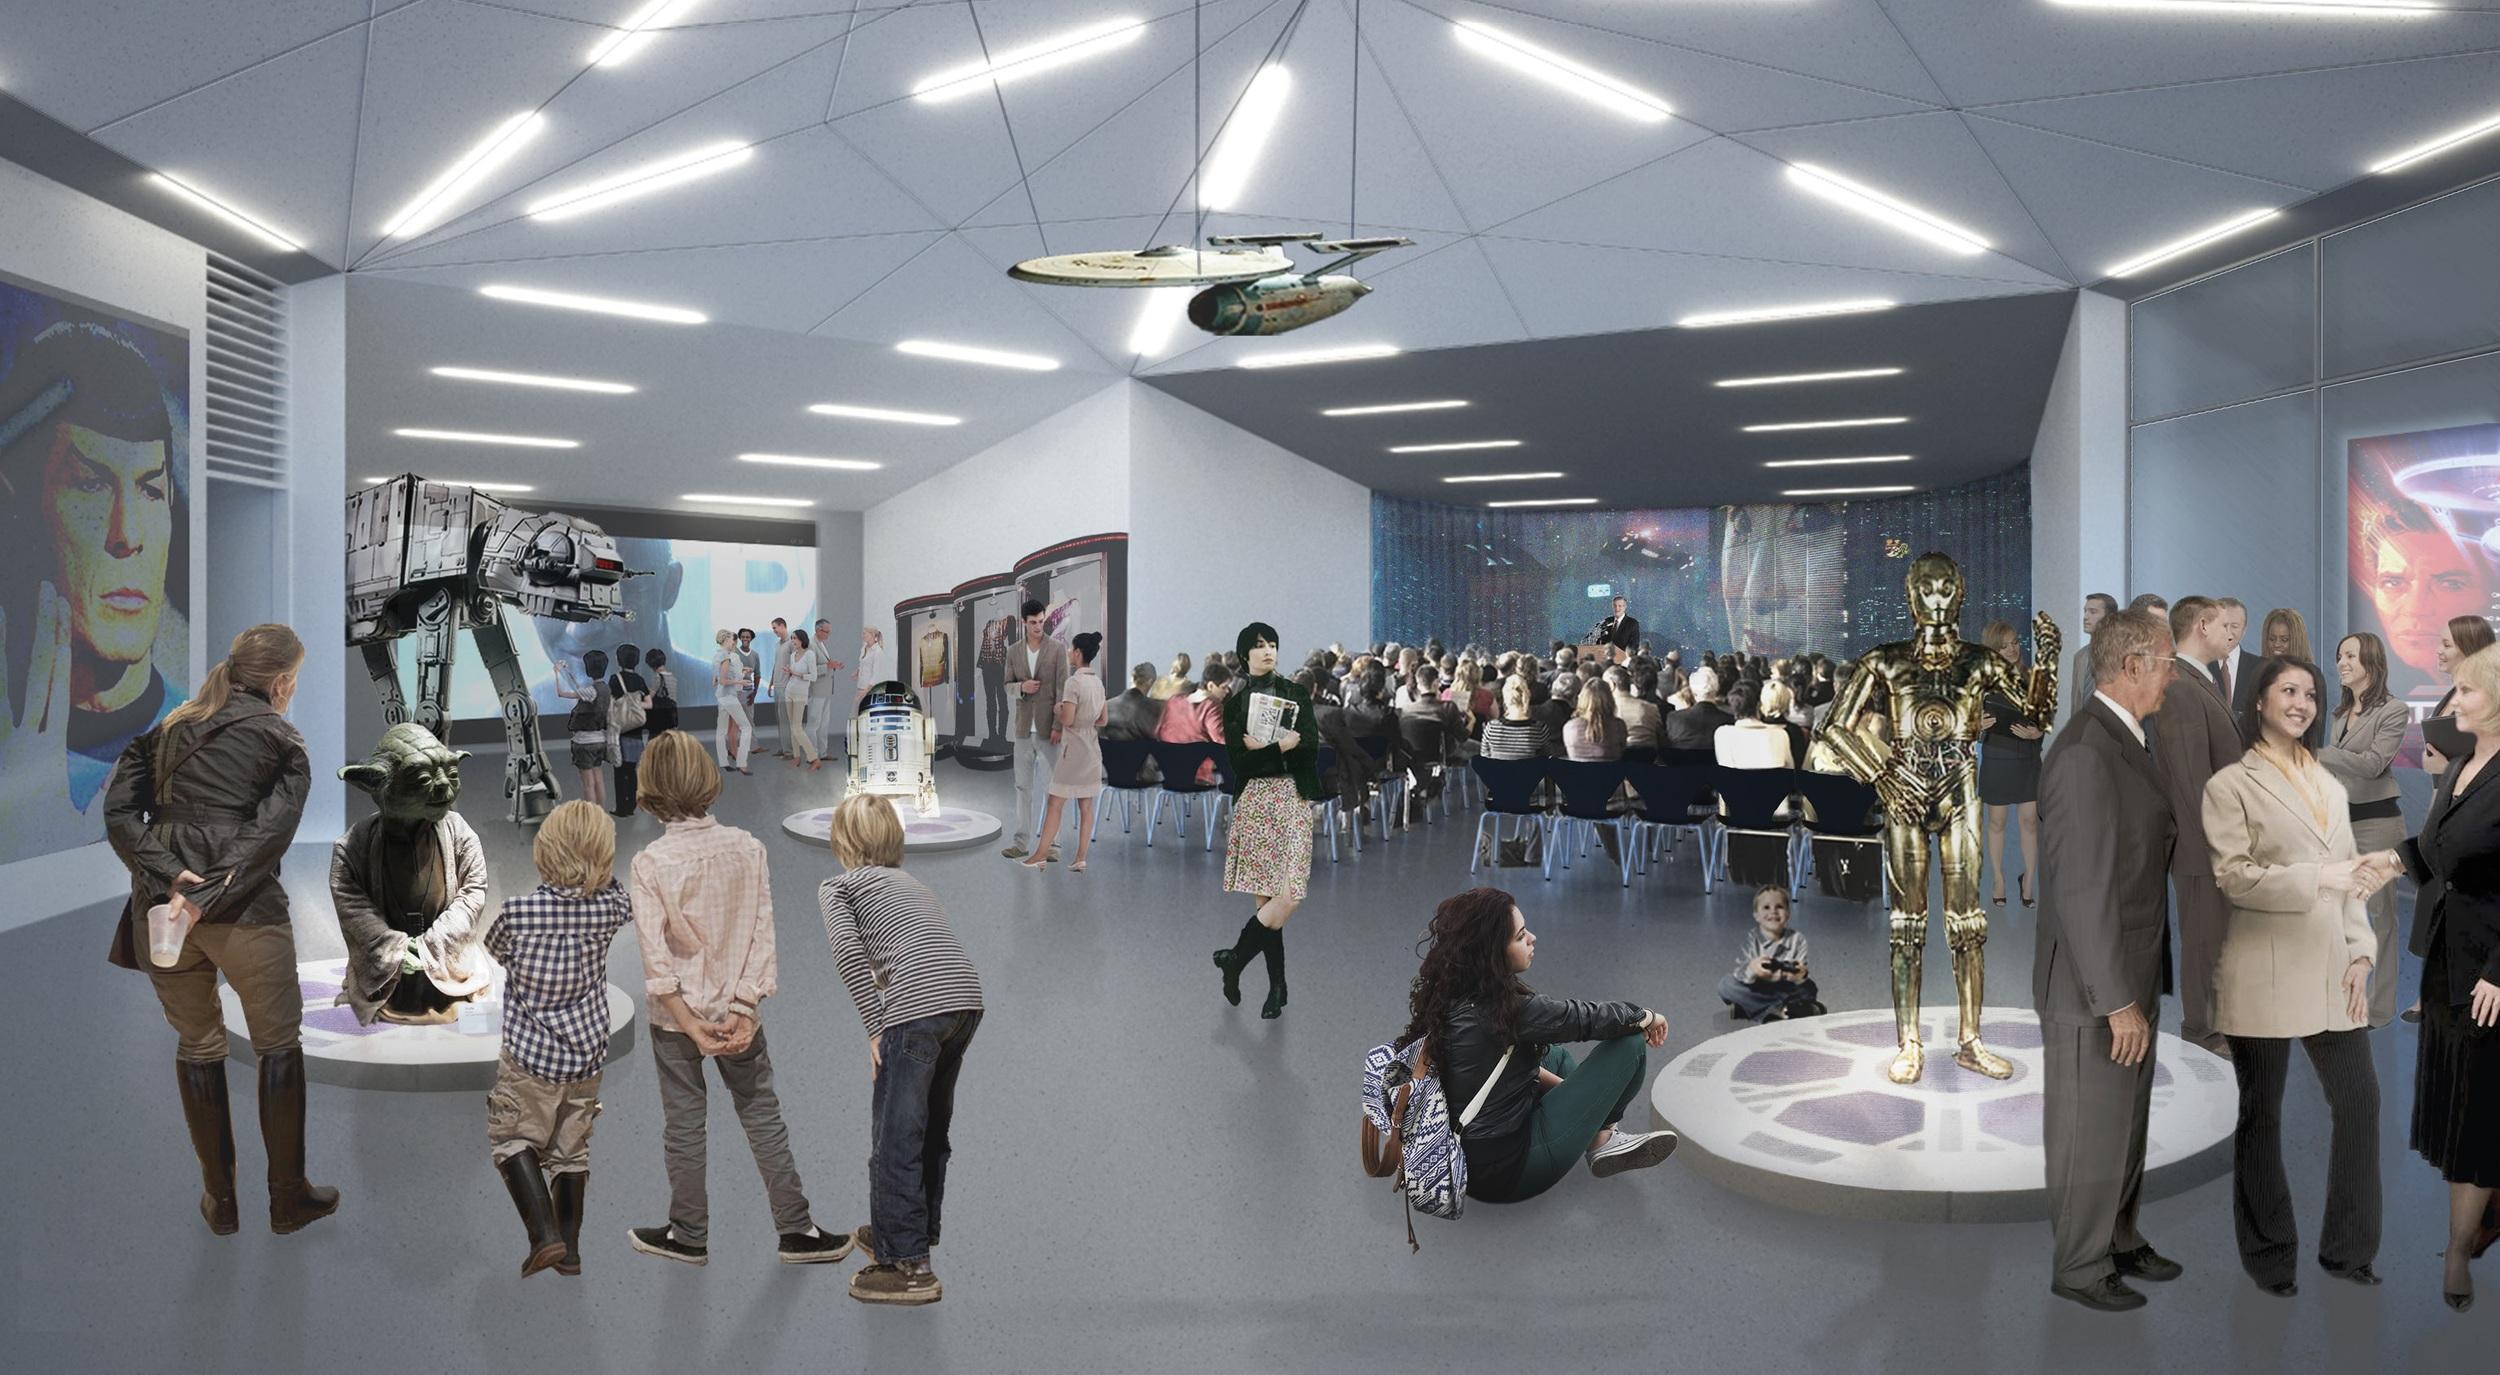 Interior design by David Garcia - MAP Architects, Denmark